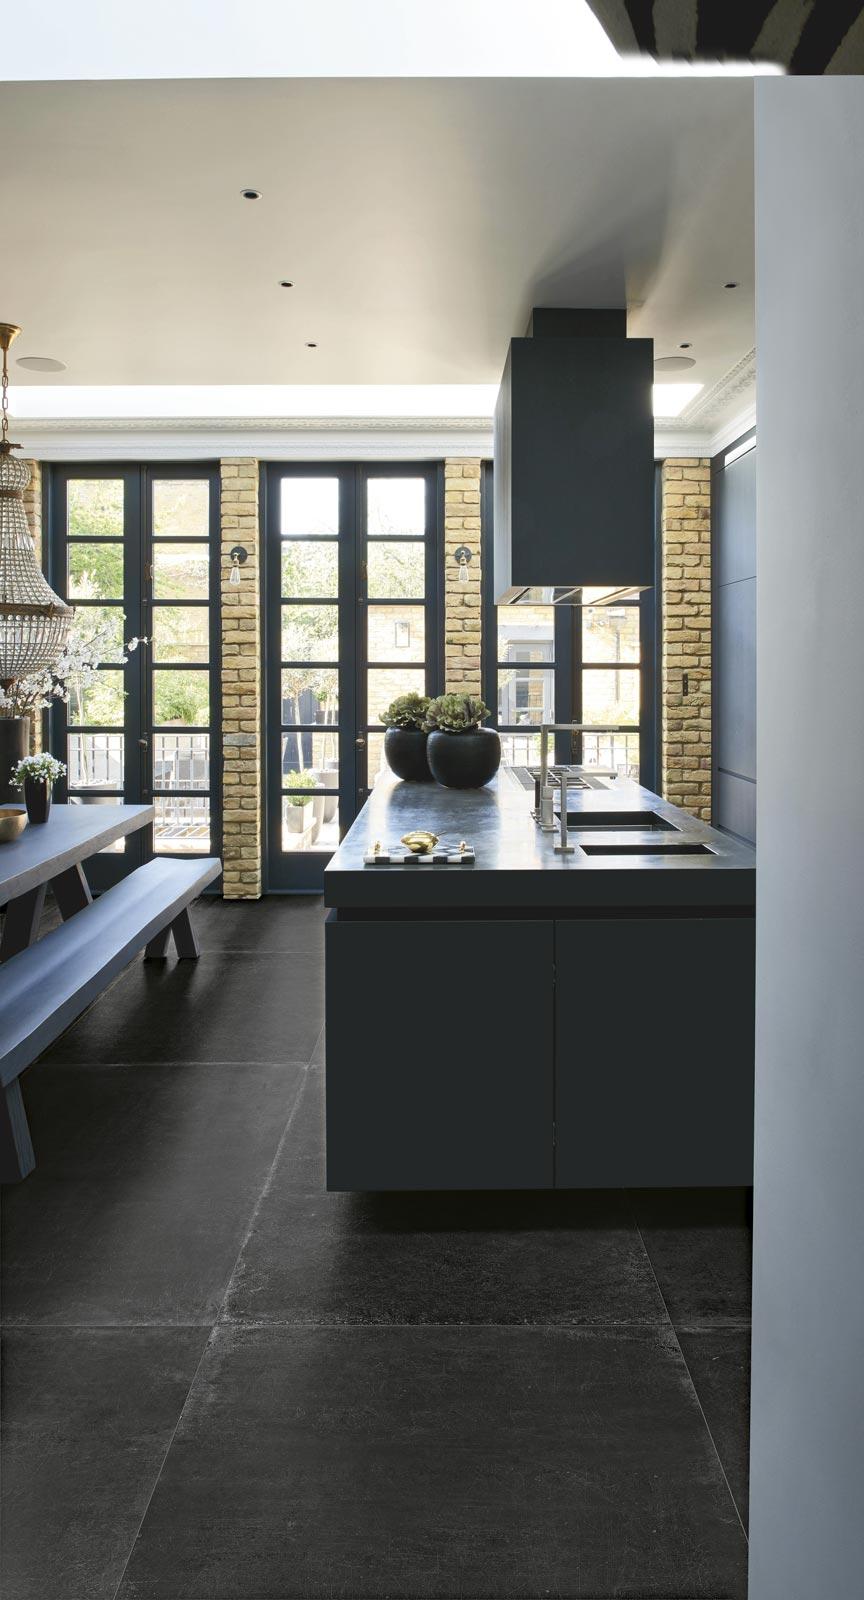 petrolio_kitchen.jpg